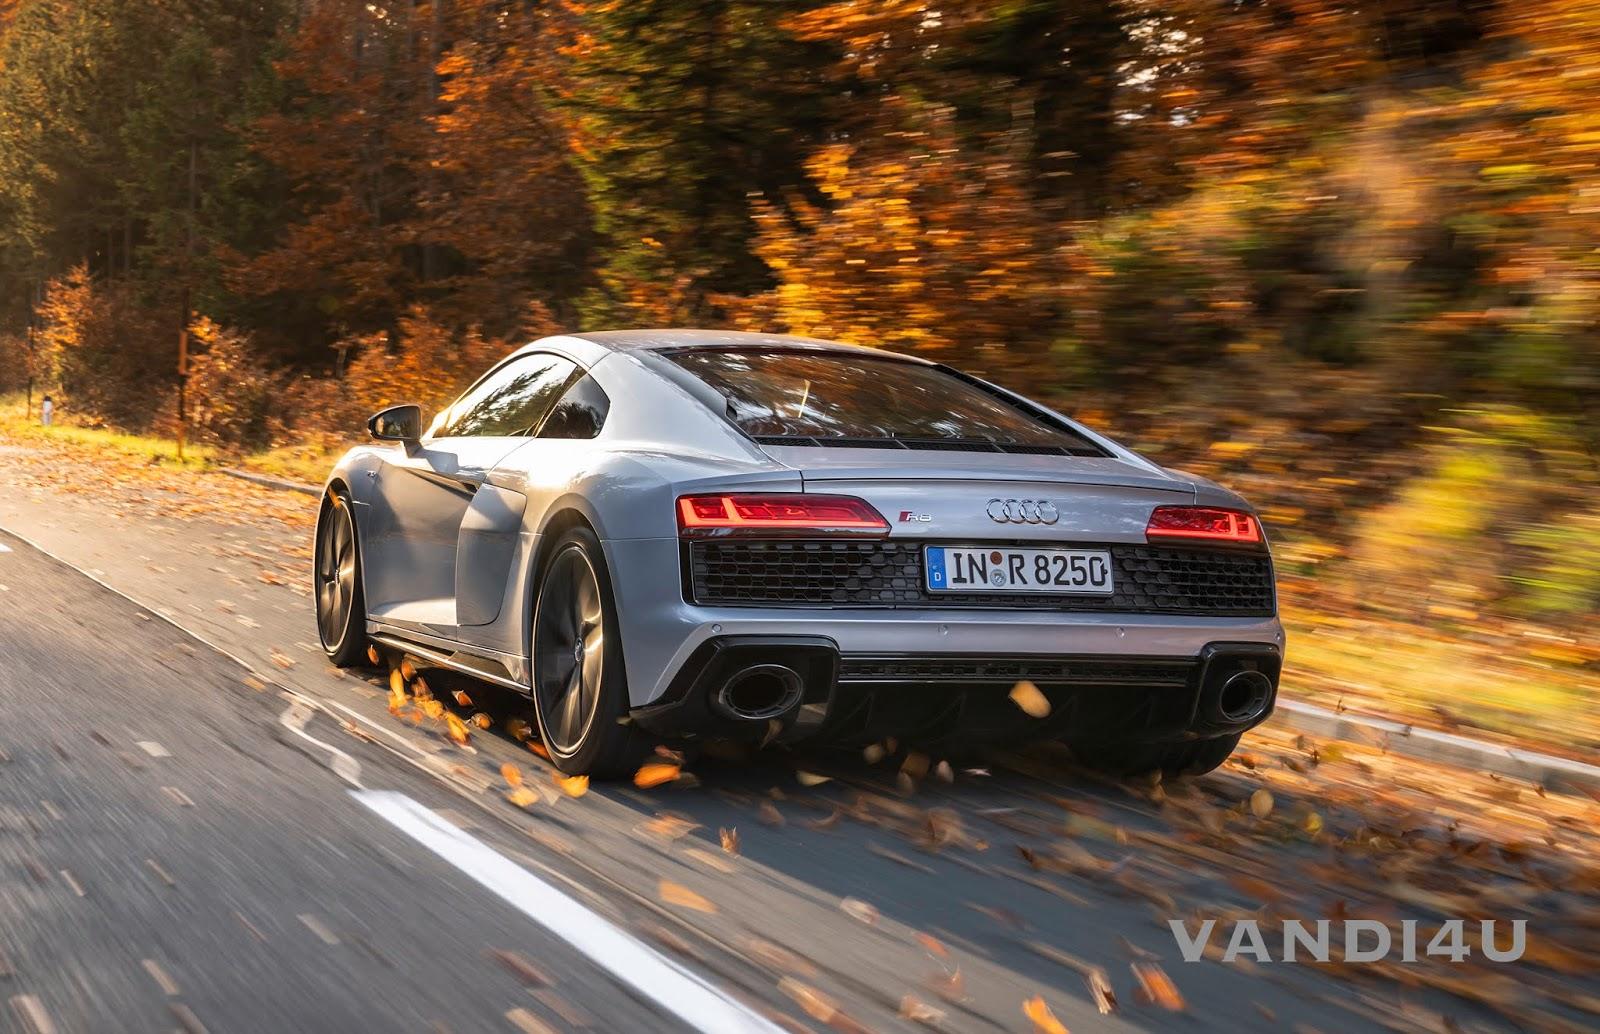 2020 Audi R8 V10 RWD Revealed: Top 5 things to know | VANDI4U